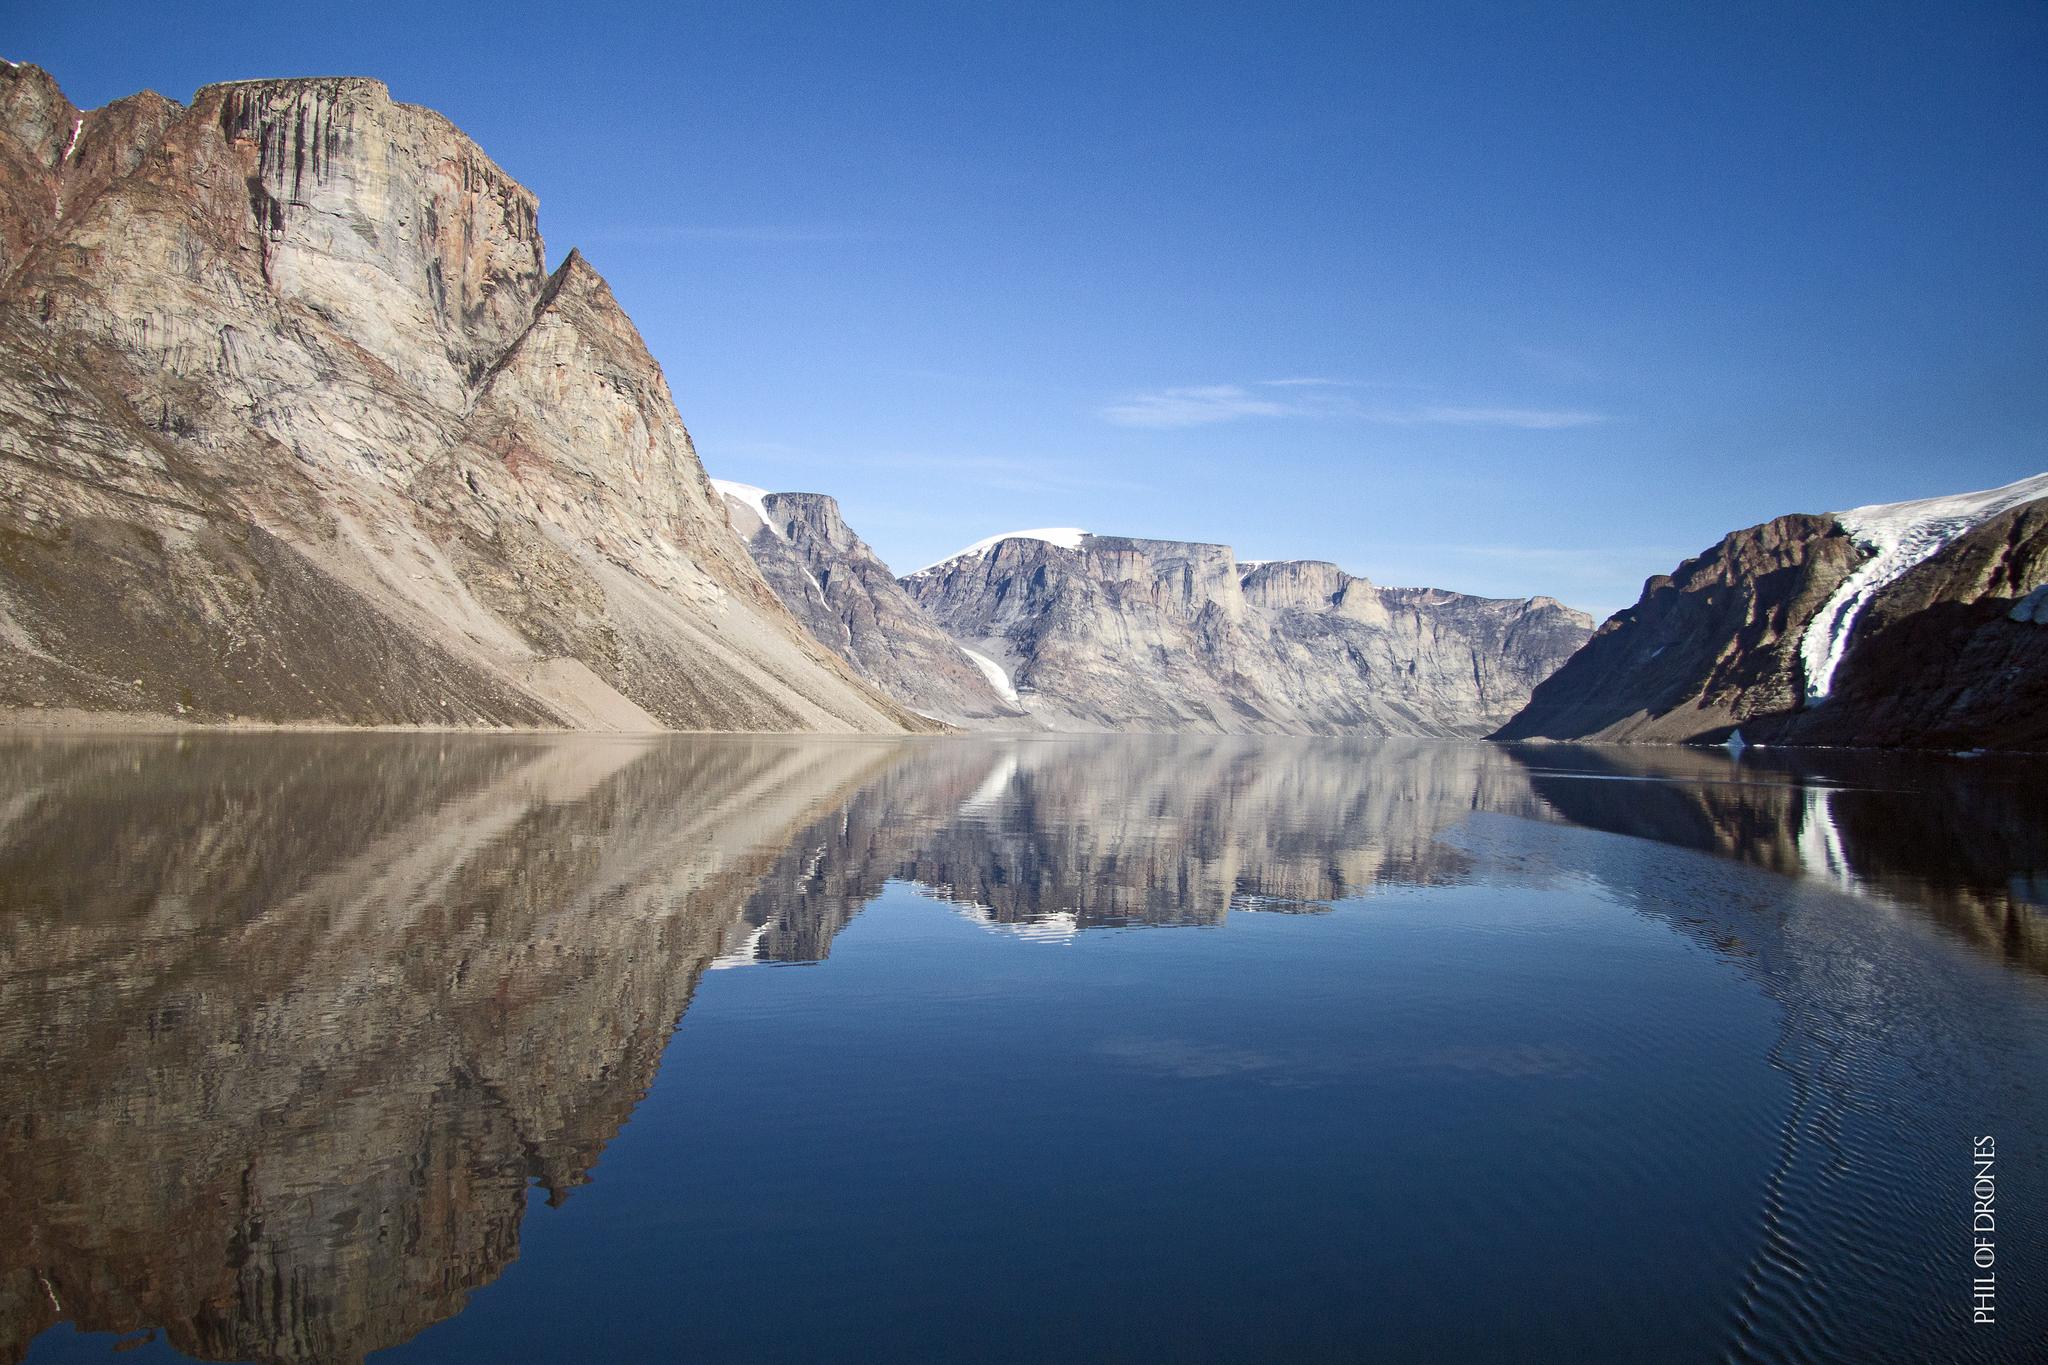 19-08 ice fjord-7-PhM.jpg